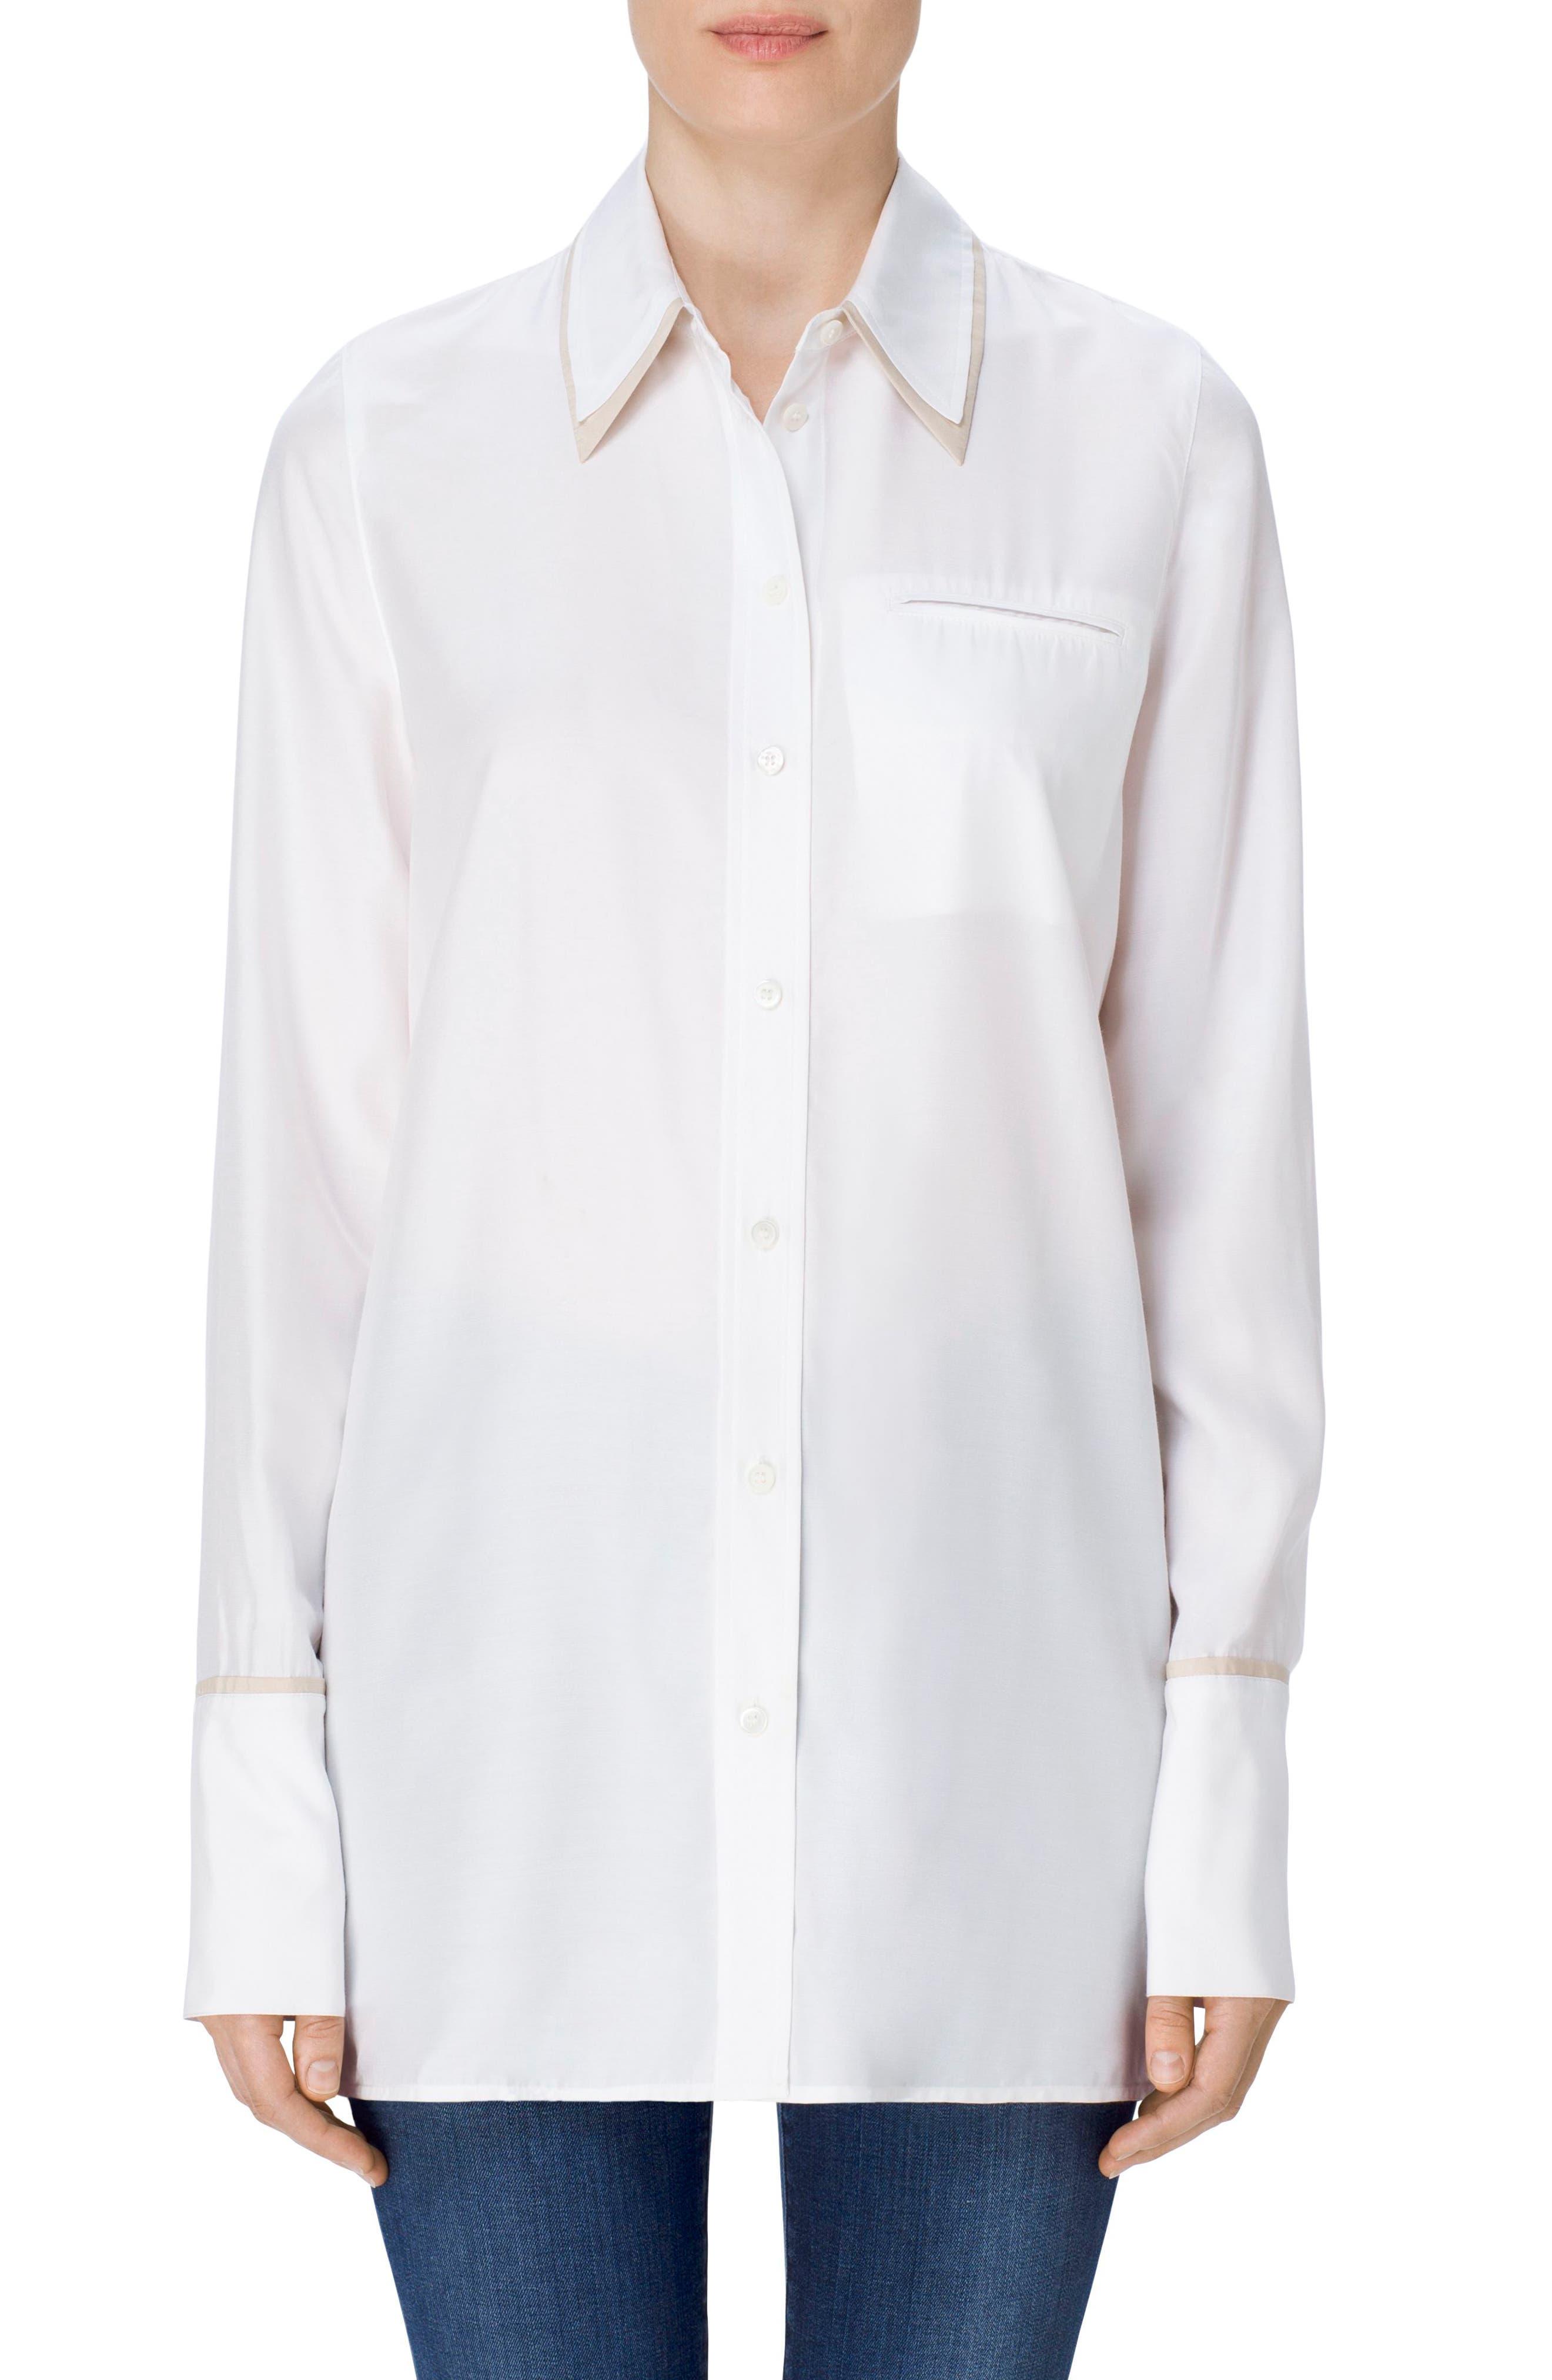 Alternate Image 1 Selected - J Brand Blake Oversize Shirt